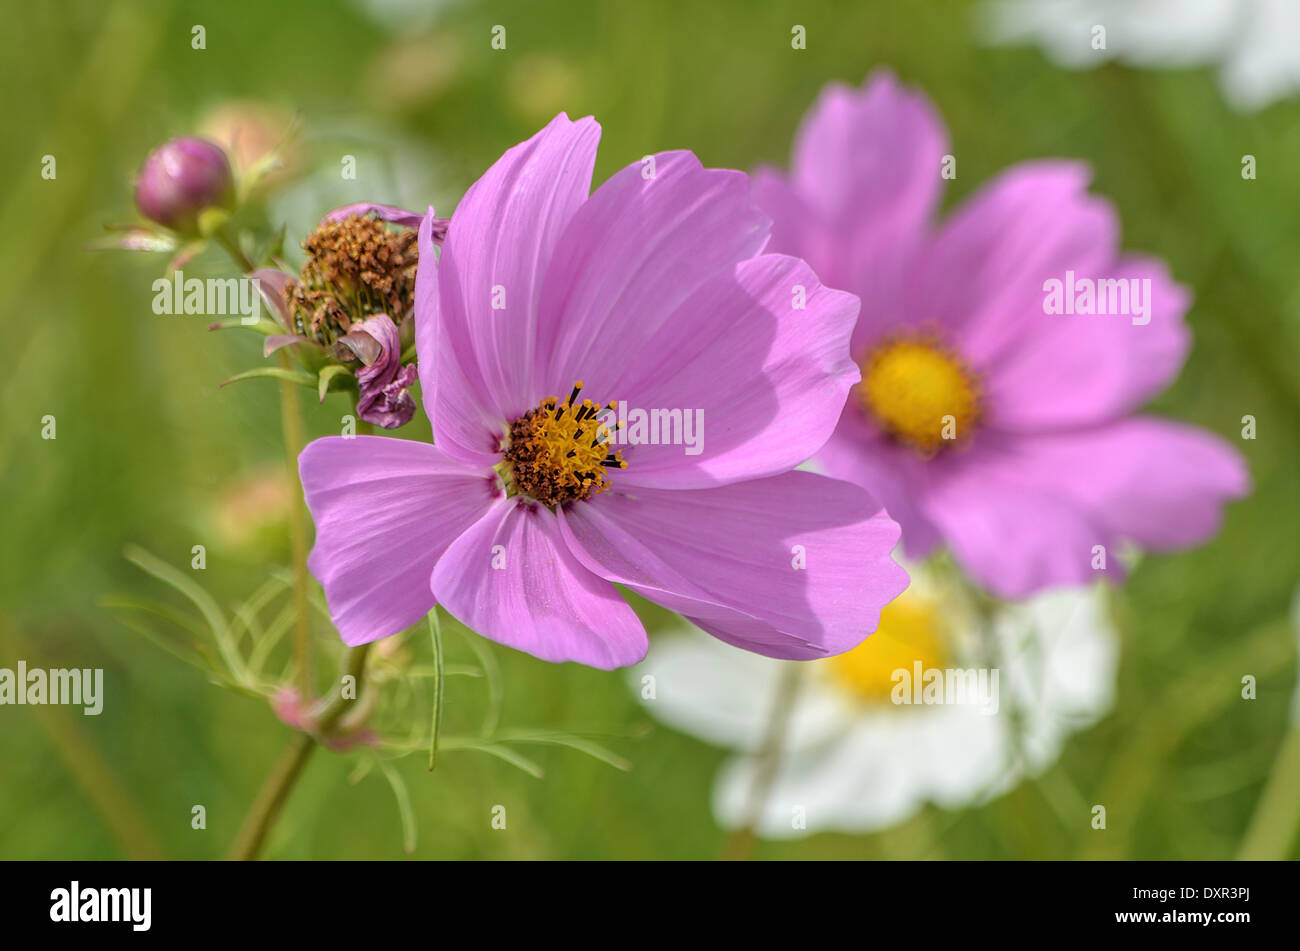 Pink Cosmo Flower Stock Photo 68120042 Alamy